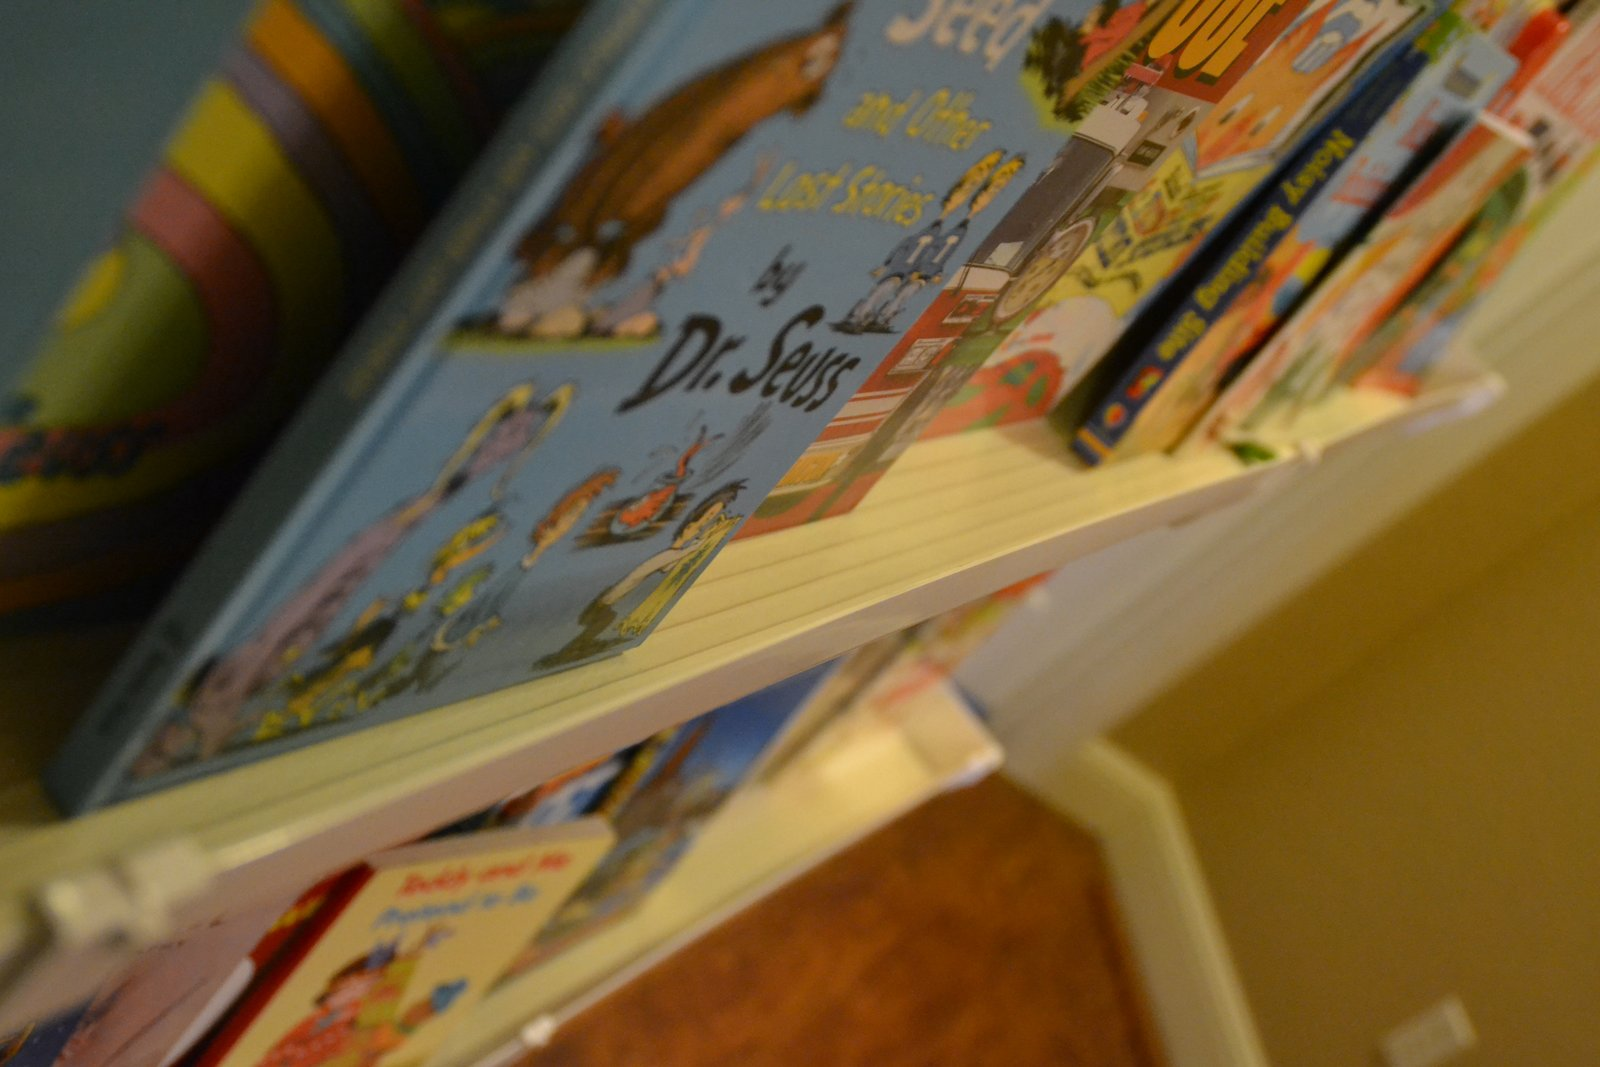 Thricethespice Rain Gutter Bookshelf